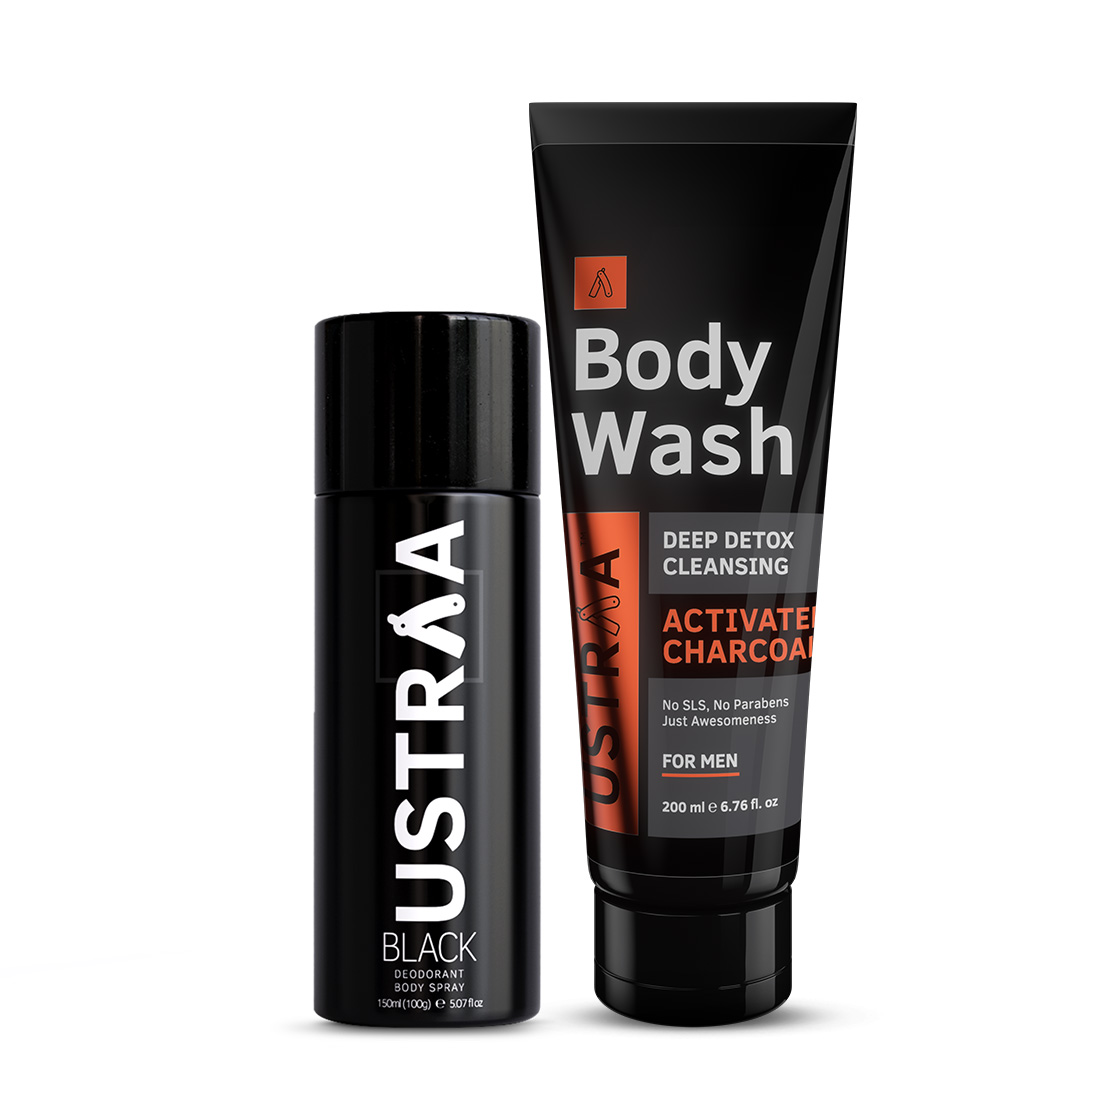 Ustraa | Ustraa Black Deodorant 150ml & Body Wash Activated Charcoal 200g